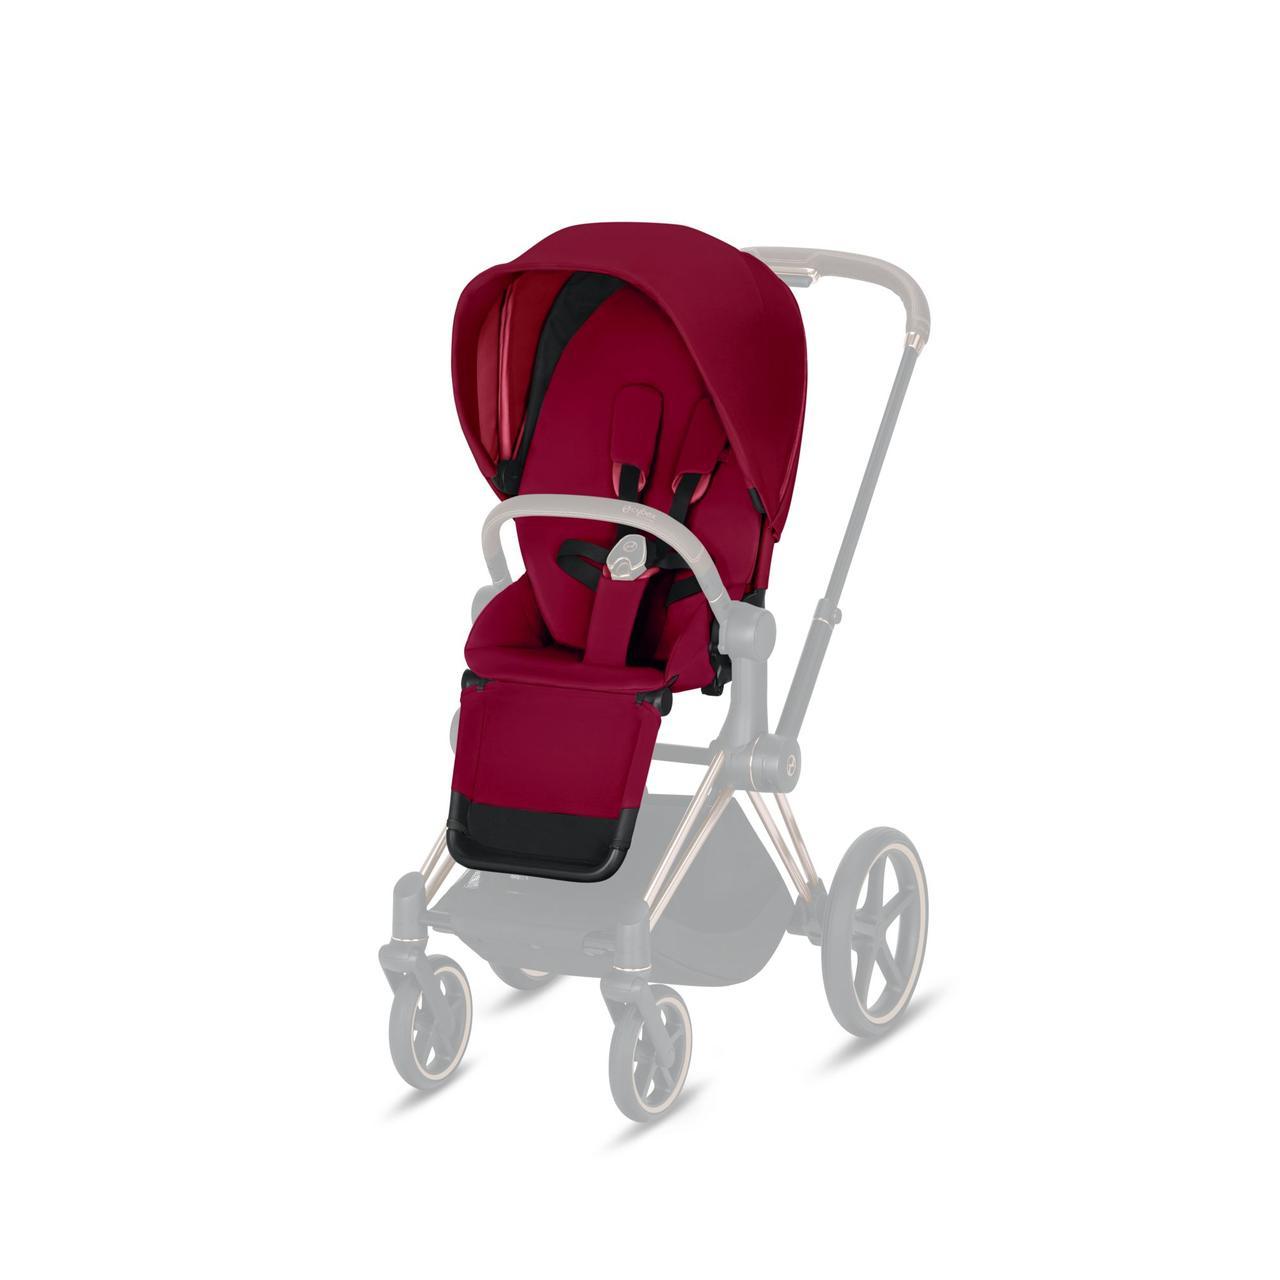 Cybex - Комплект ткани для Priam Lux Seat, цвет True Red